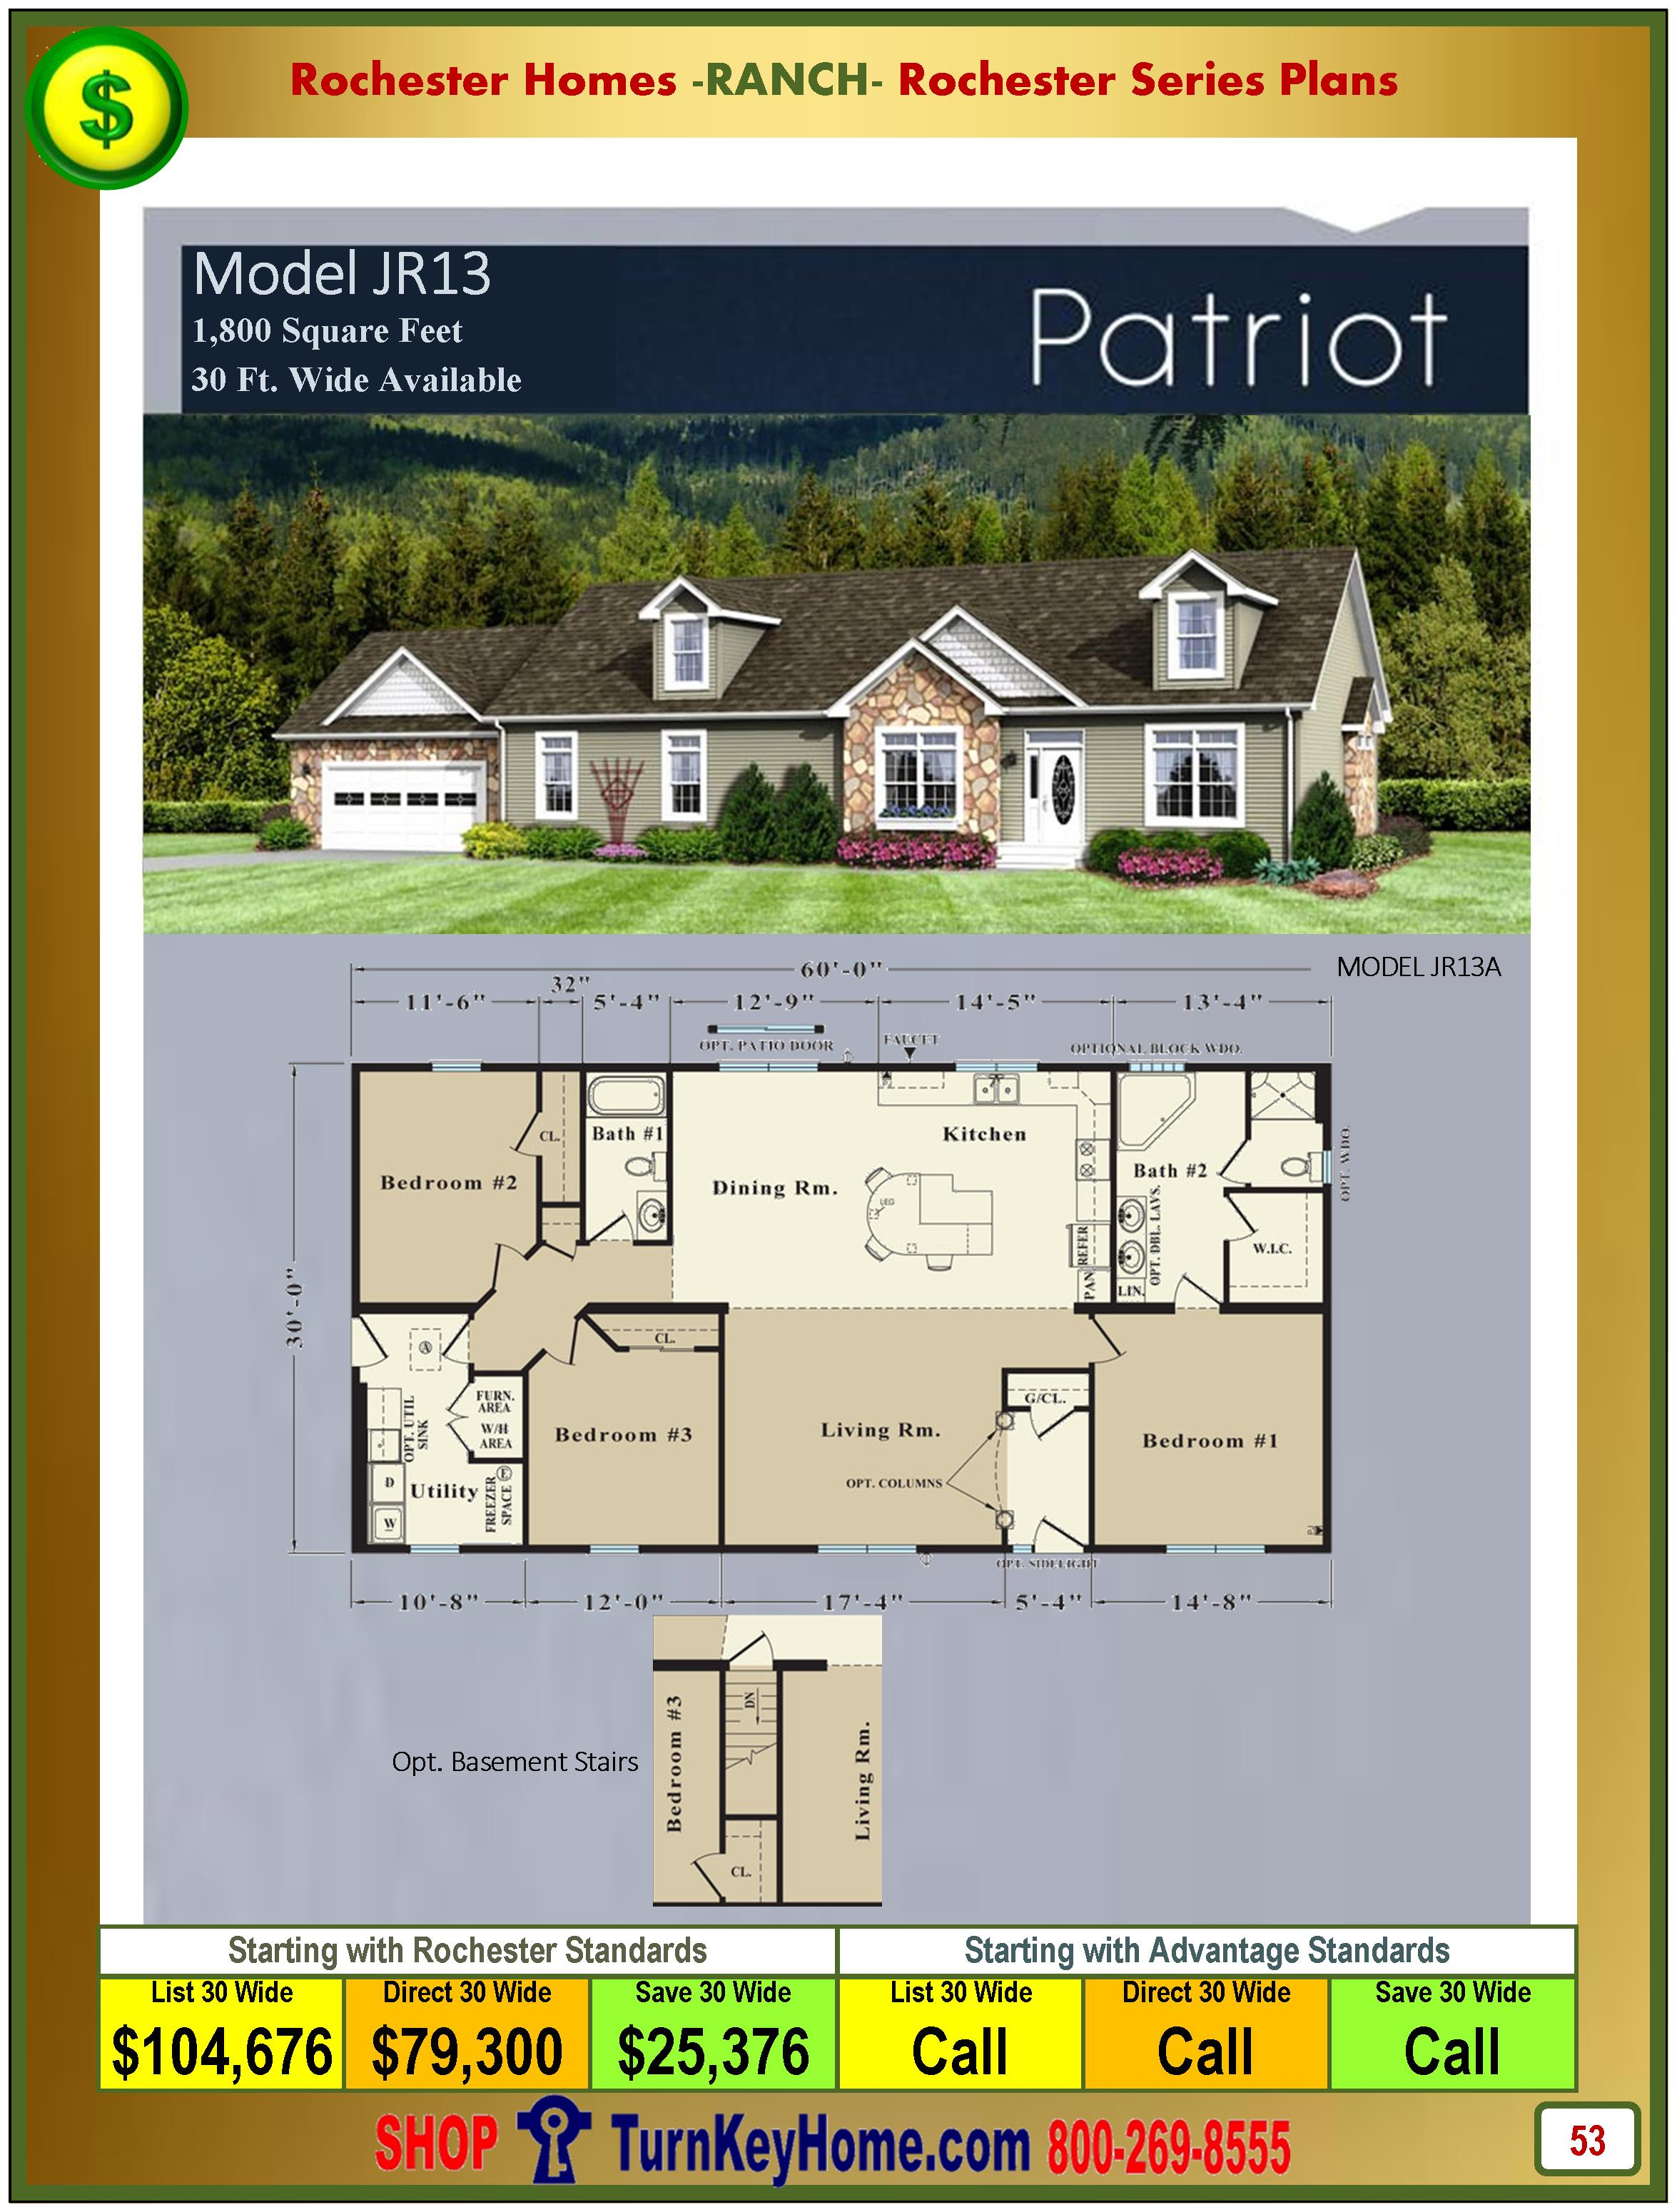 Modular.Homes.Rochester.Home.Inc.Patriot.JR13.Ranch.Plan.Price.Catalog.P53.1215